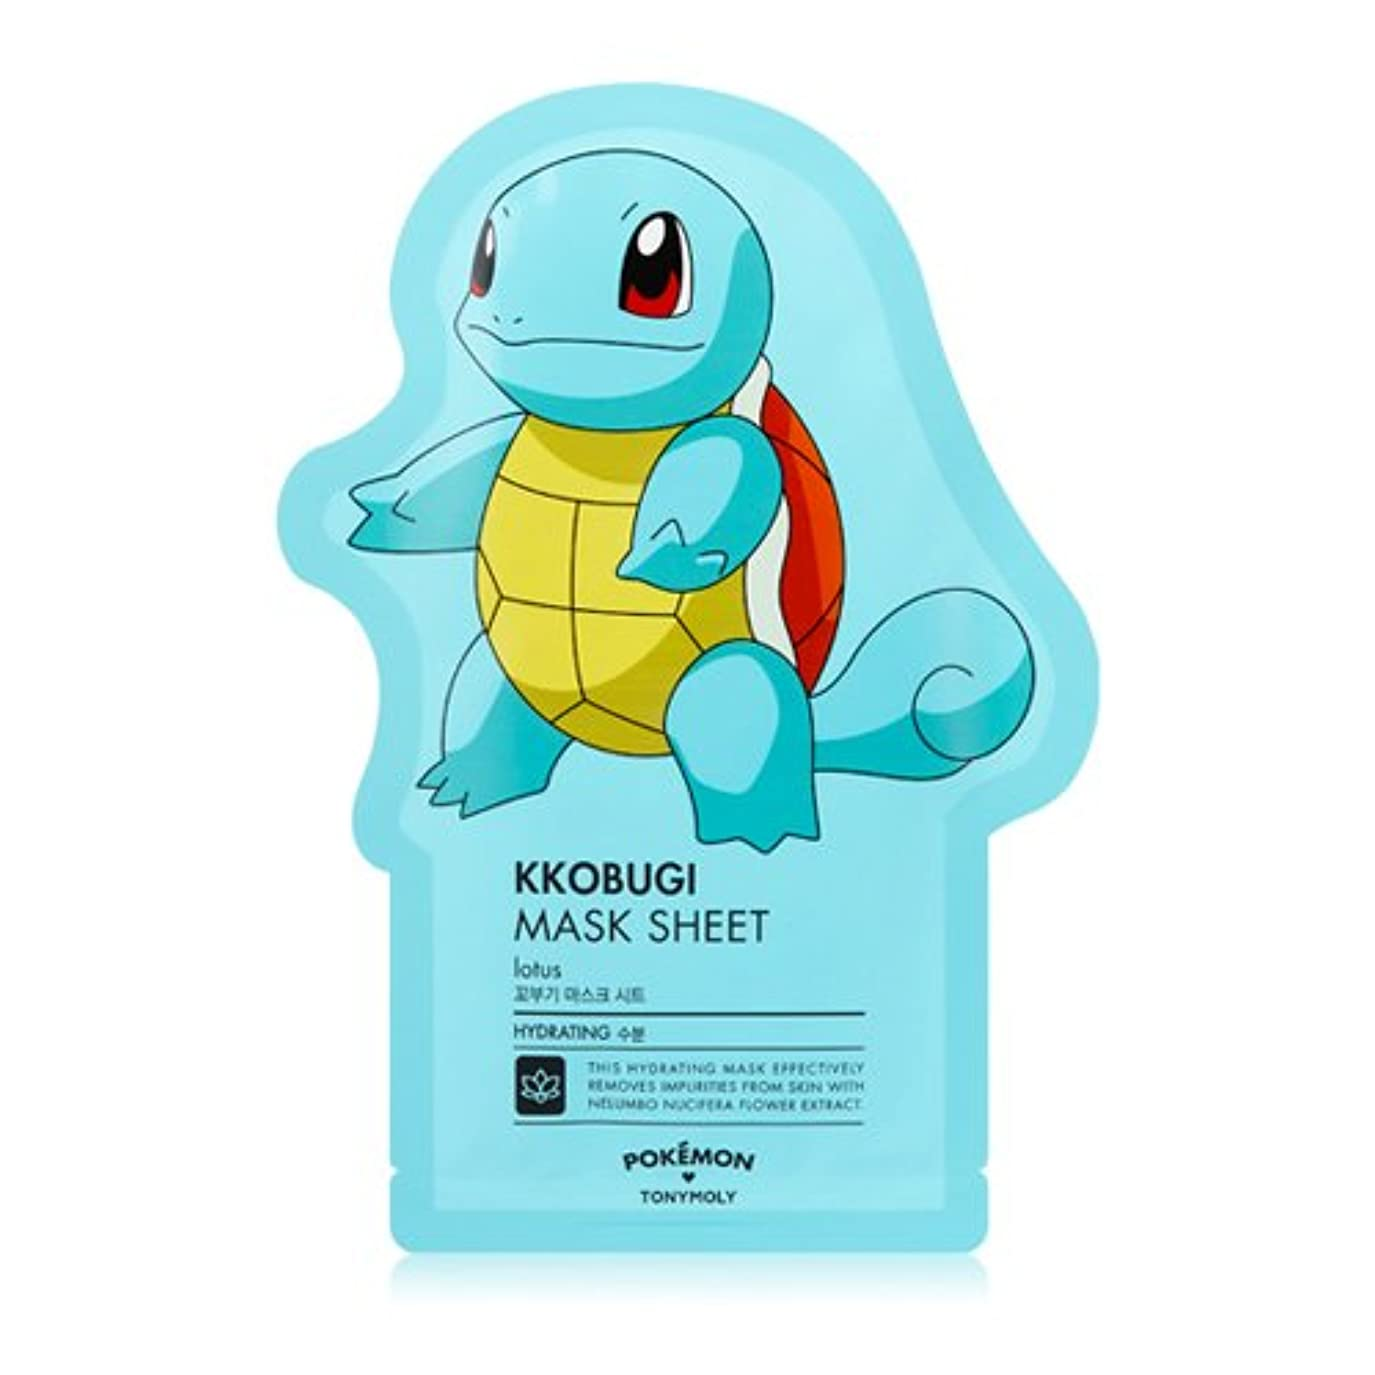 簿記係段落欲望TONYMOLY x Pokemon Squirtle/Kkobugi Mask Sheet (並行輸入品)